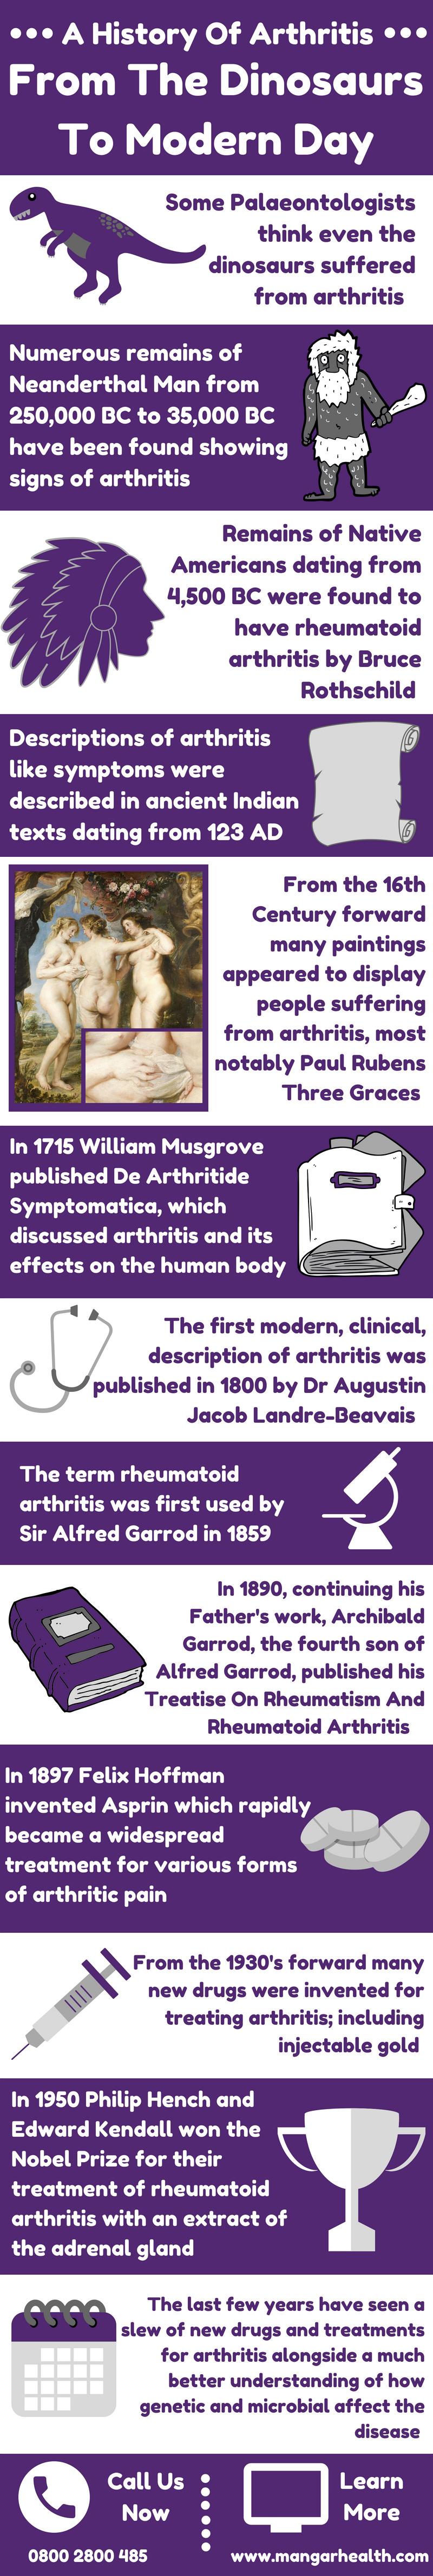 history of arthritis infographic